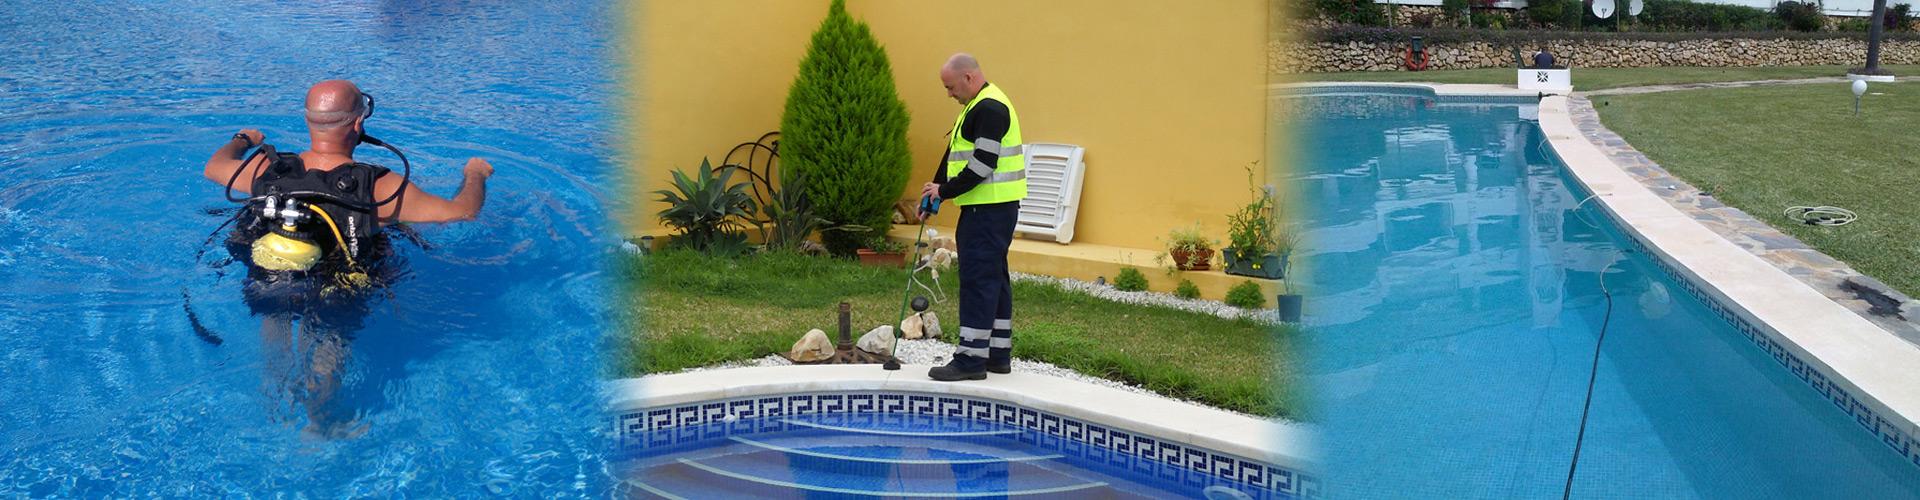 Localización de fugas de agua en piscinas